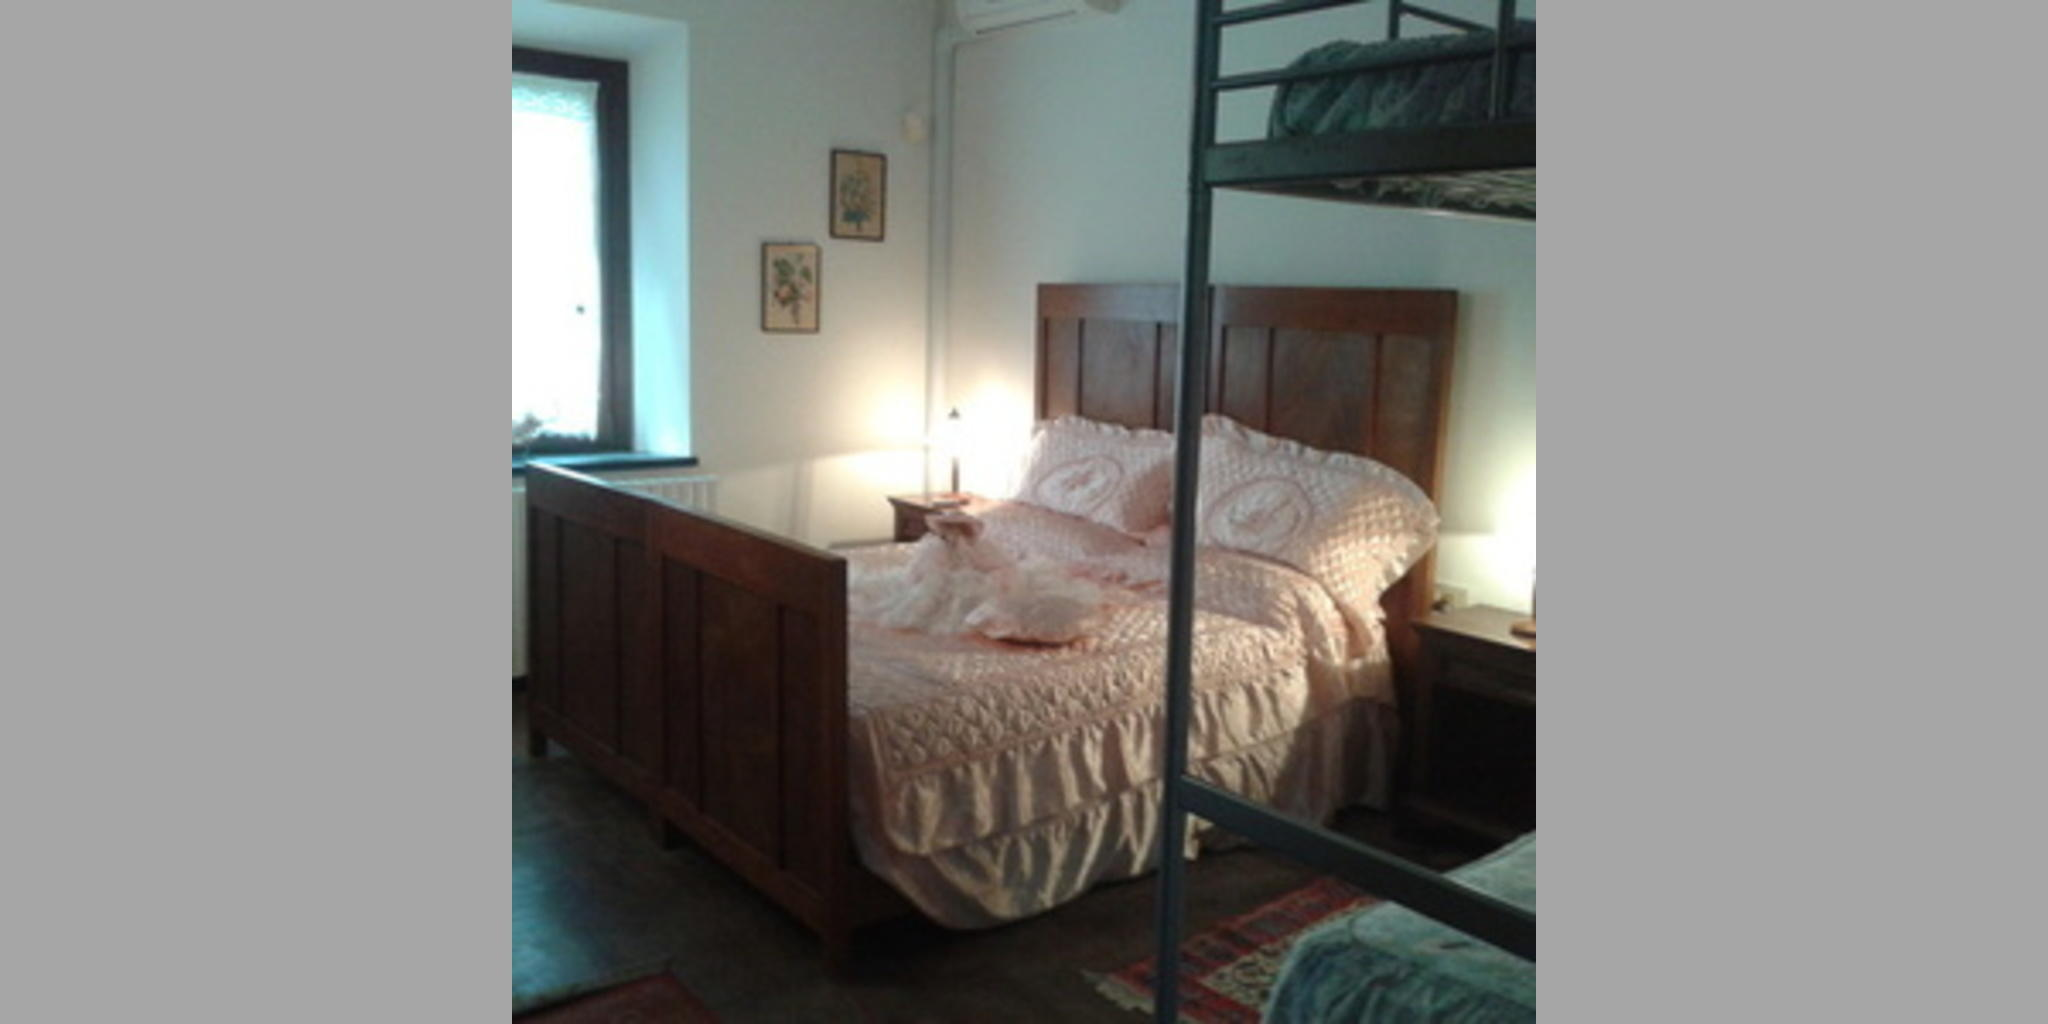 Bed & Breakfast Vinci - In Azienda Agricola A Vinci